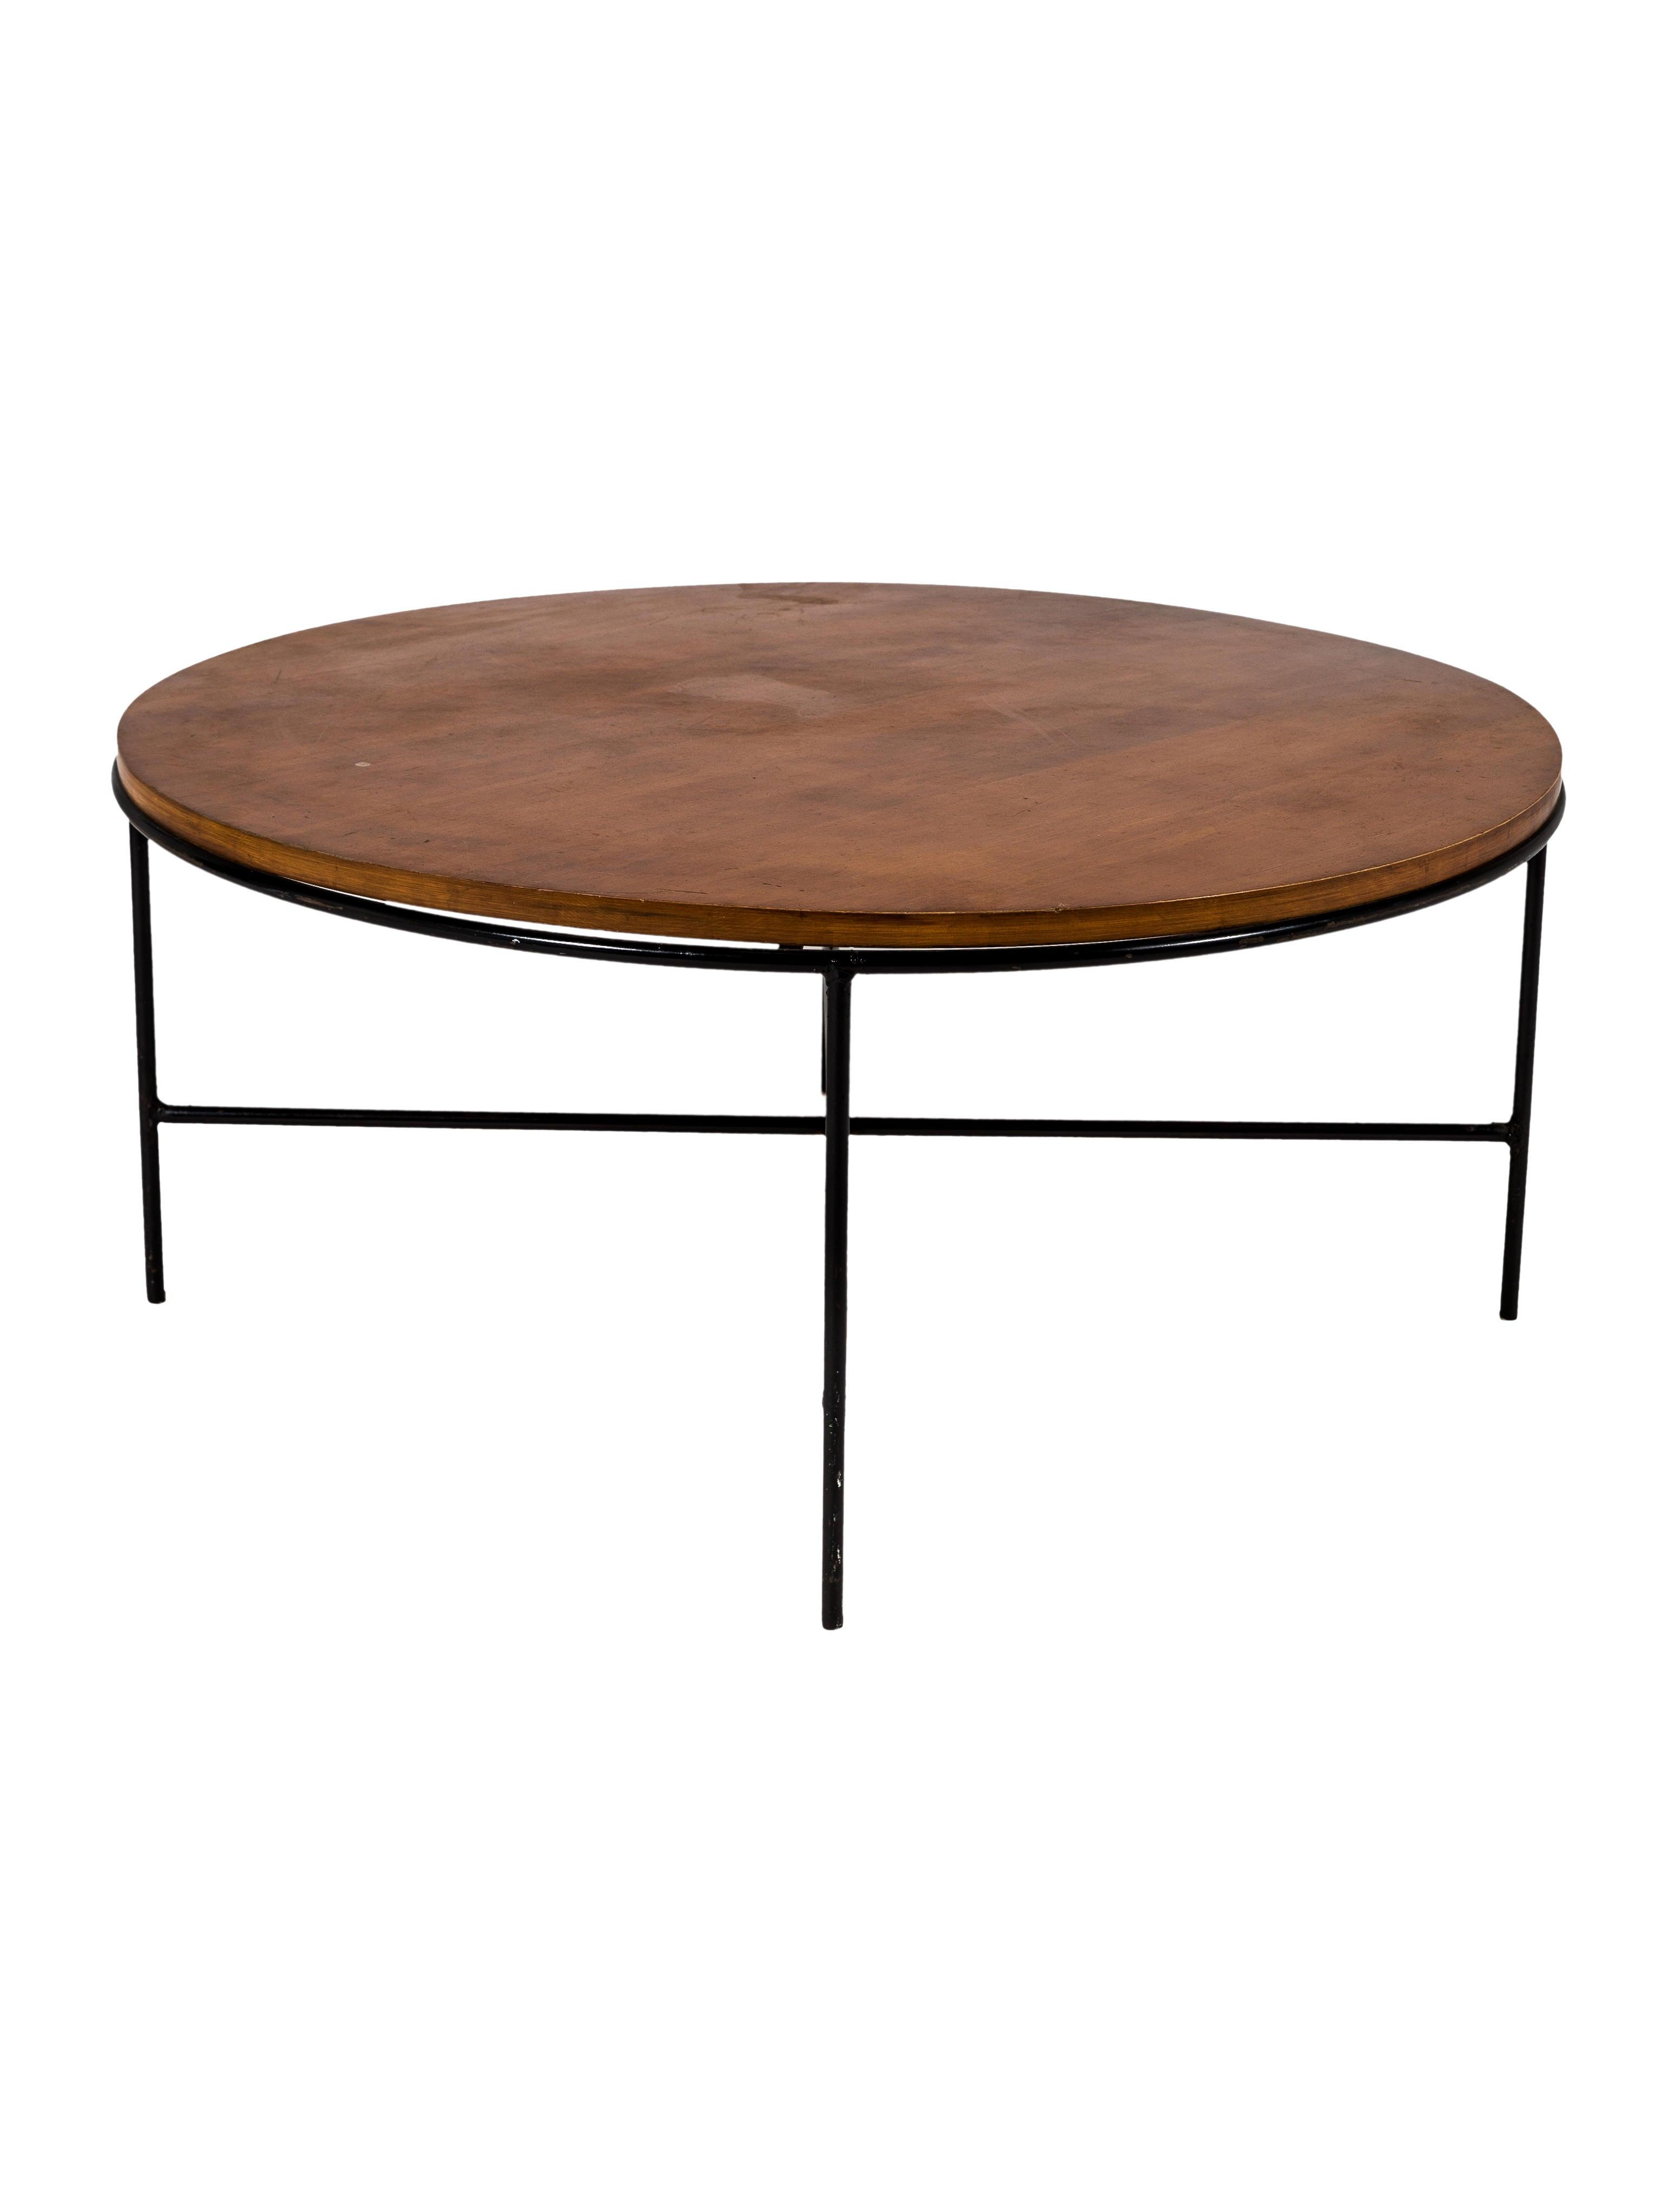 Mid Century Modern Coffee Table Furniture Coffe20074